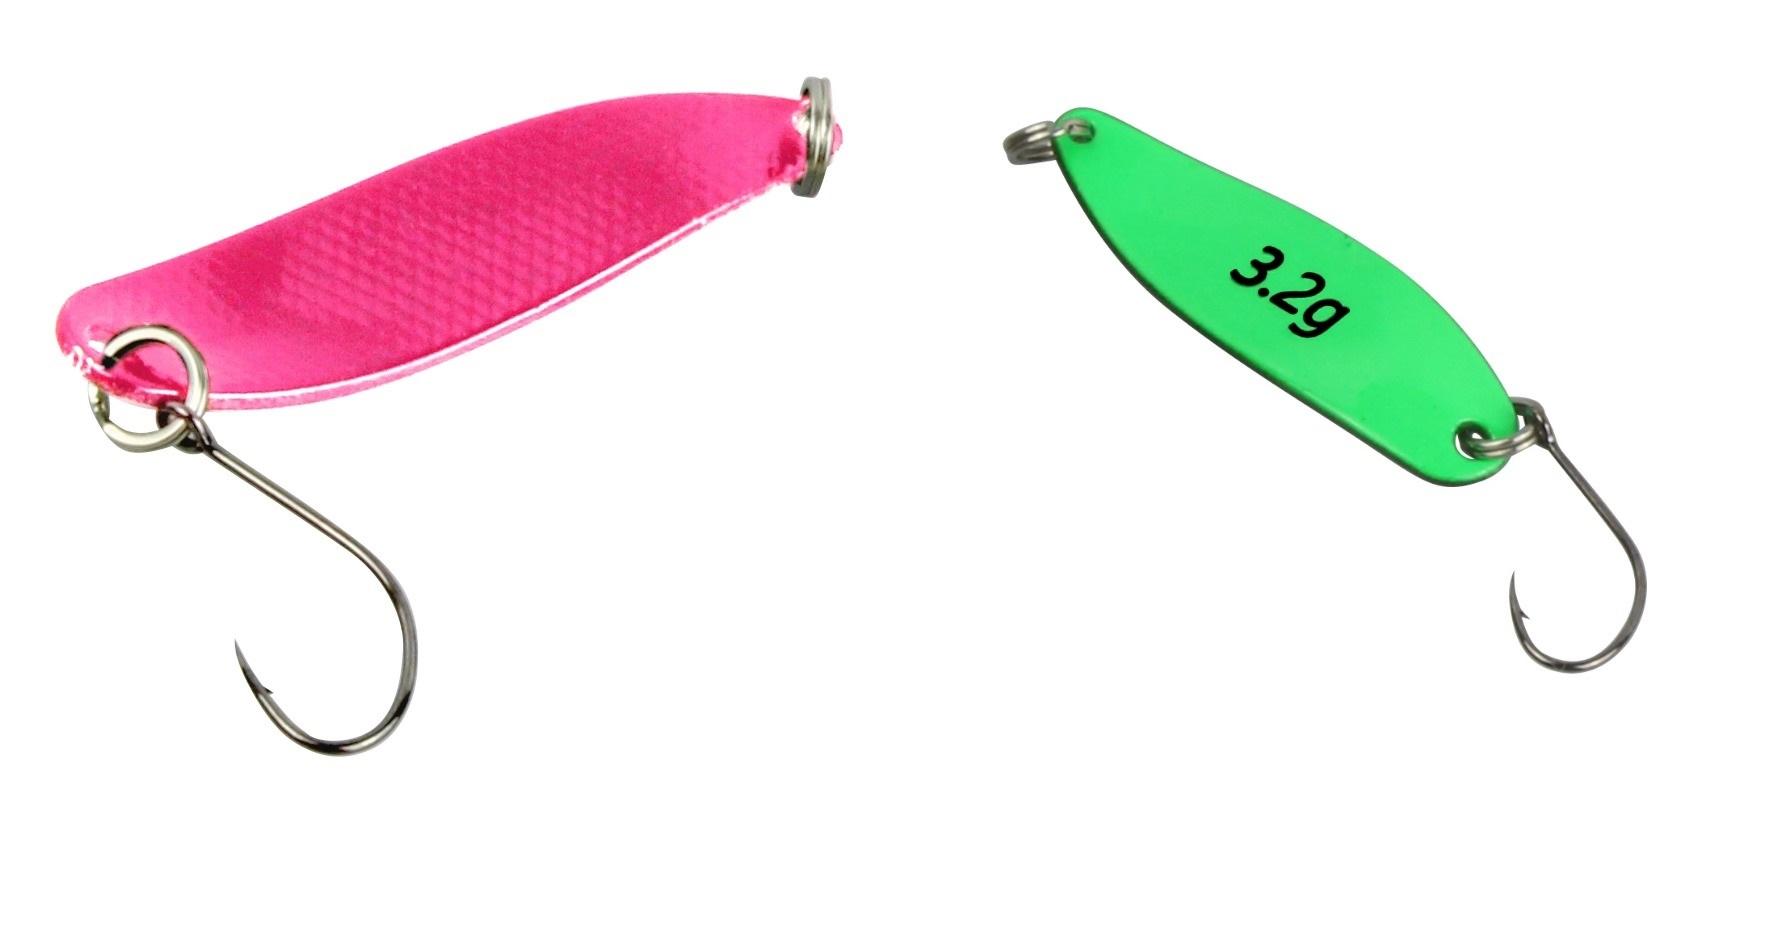 FTM Trout Spoon Forellenblinker Hammer 110 UV Pink Grün 3,2g 5200110 Ultra Light